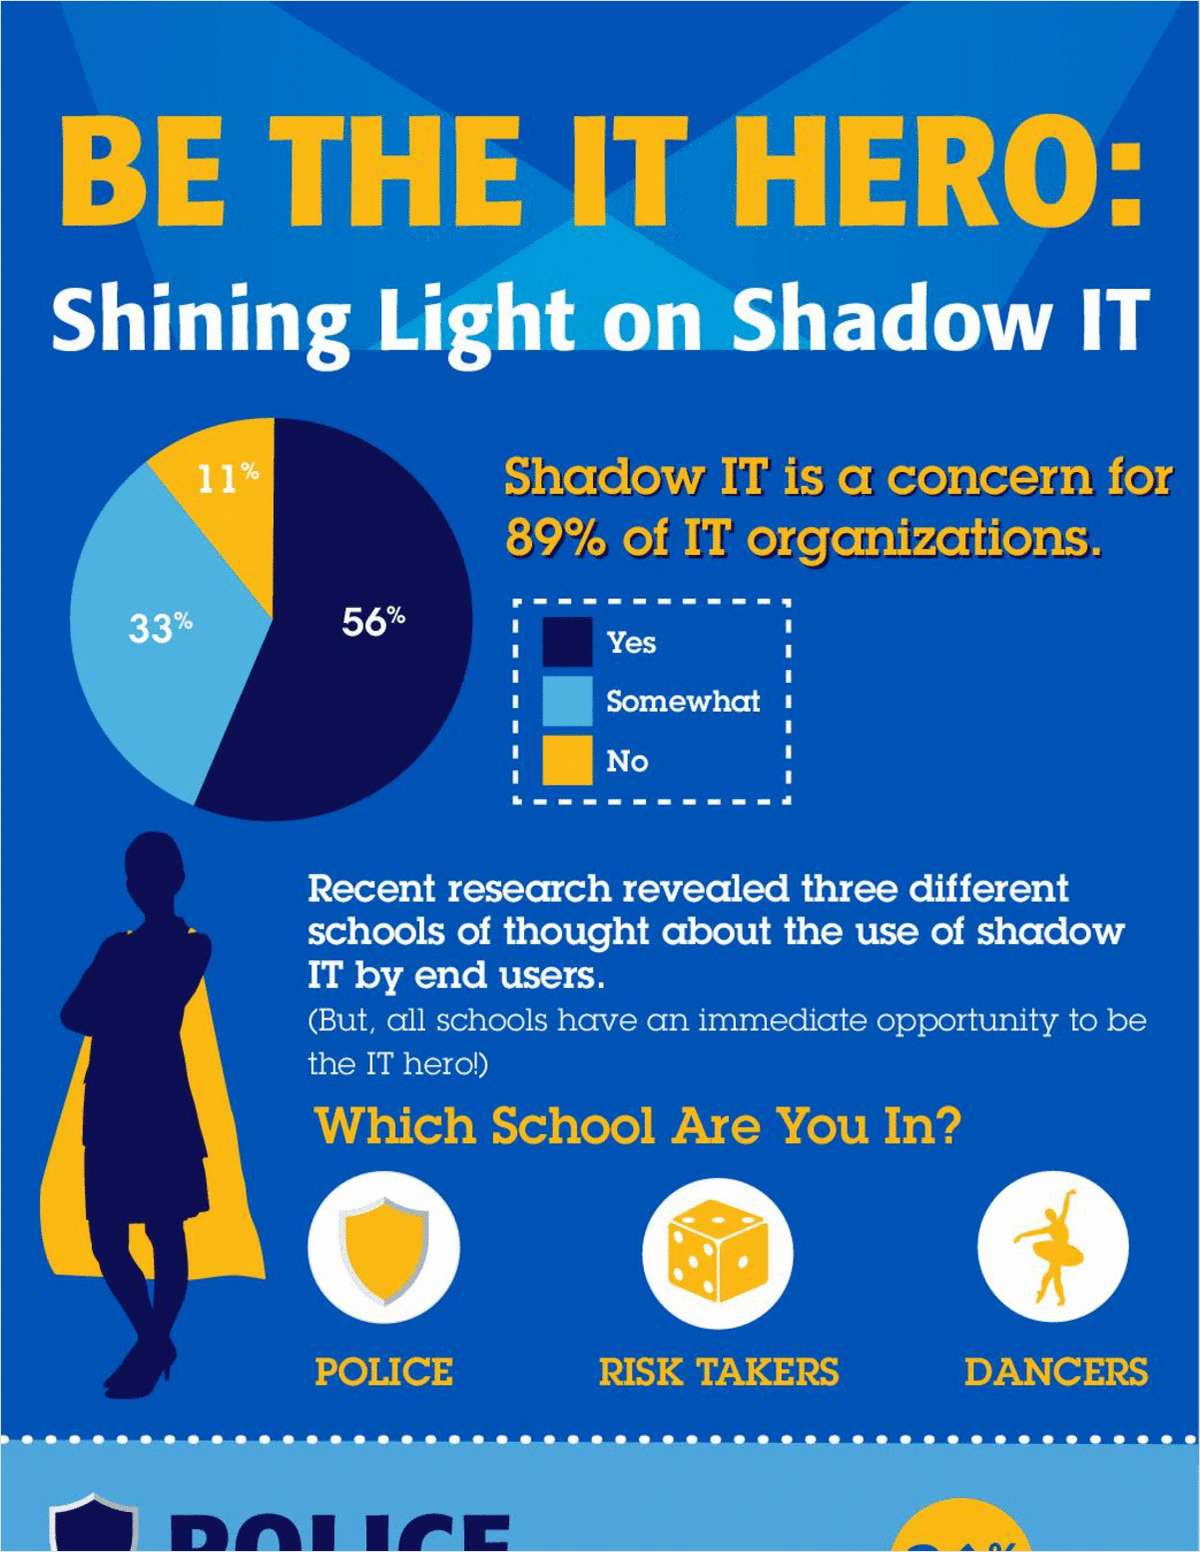 Be the IT Hero: Shining Light on Shadow IT